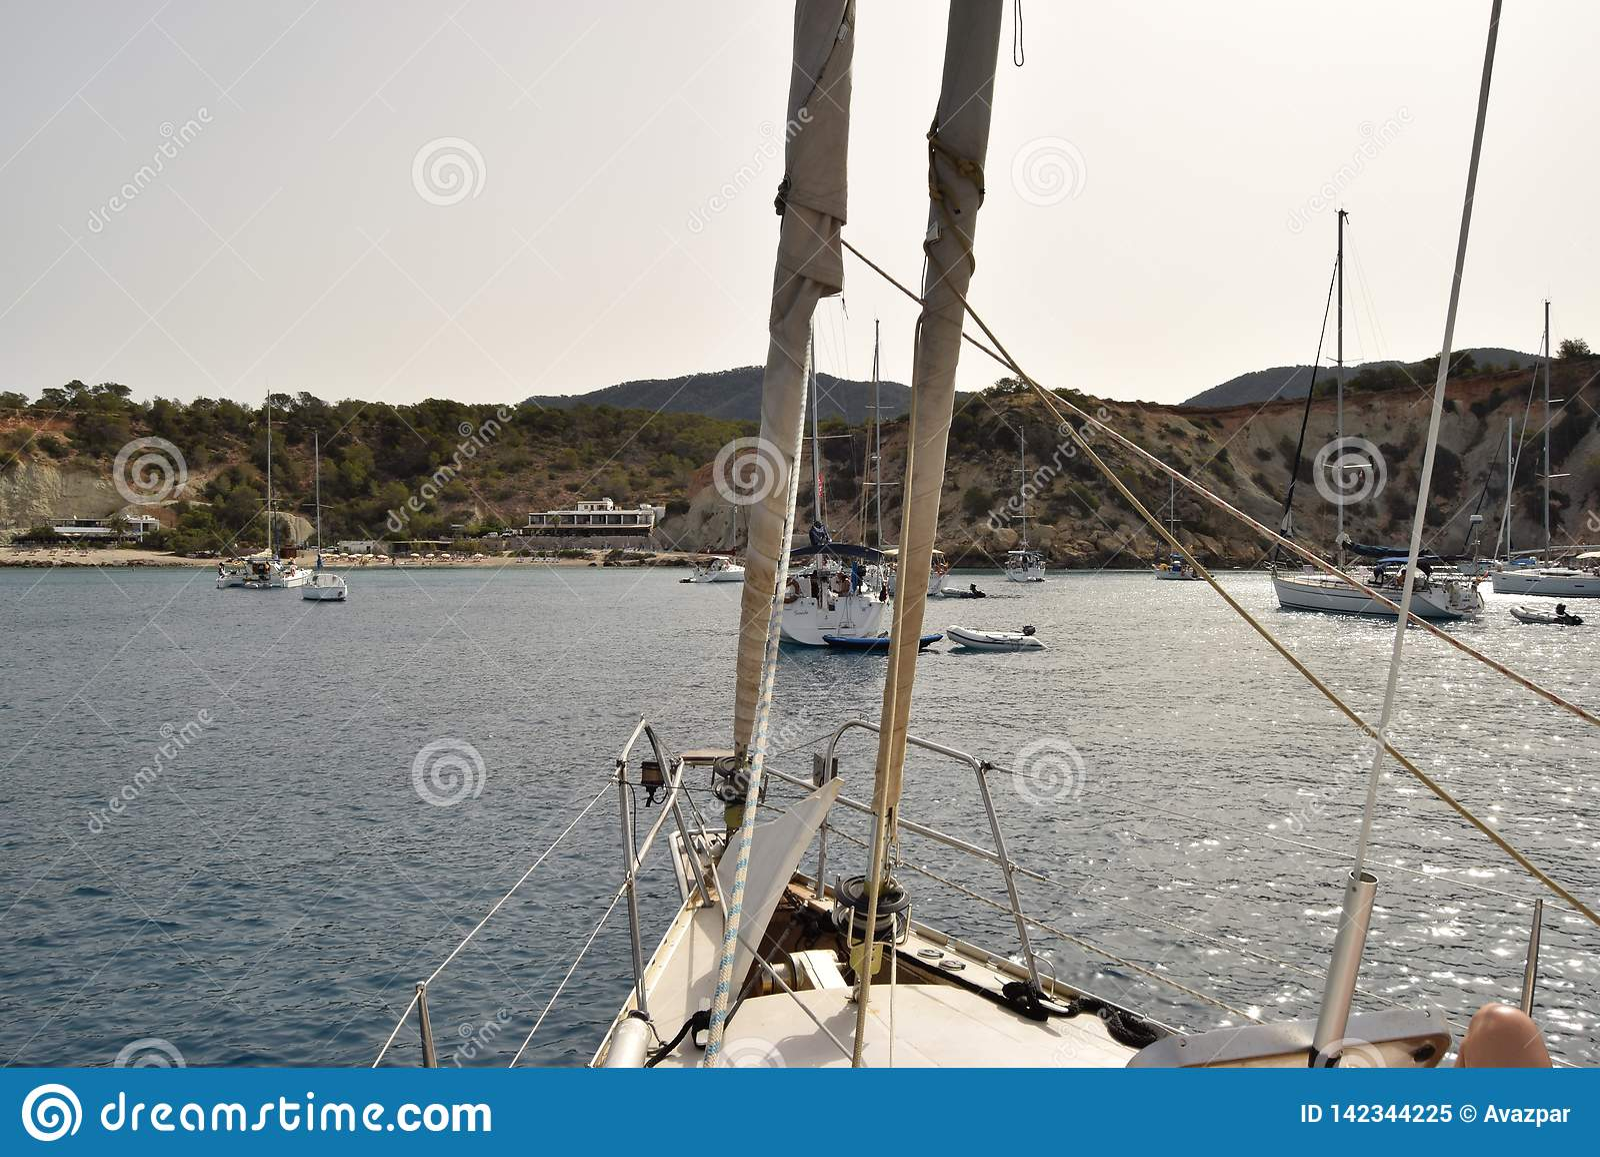 Boat sails - Ibiza Spain